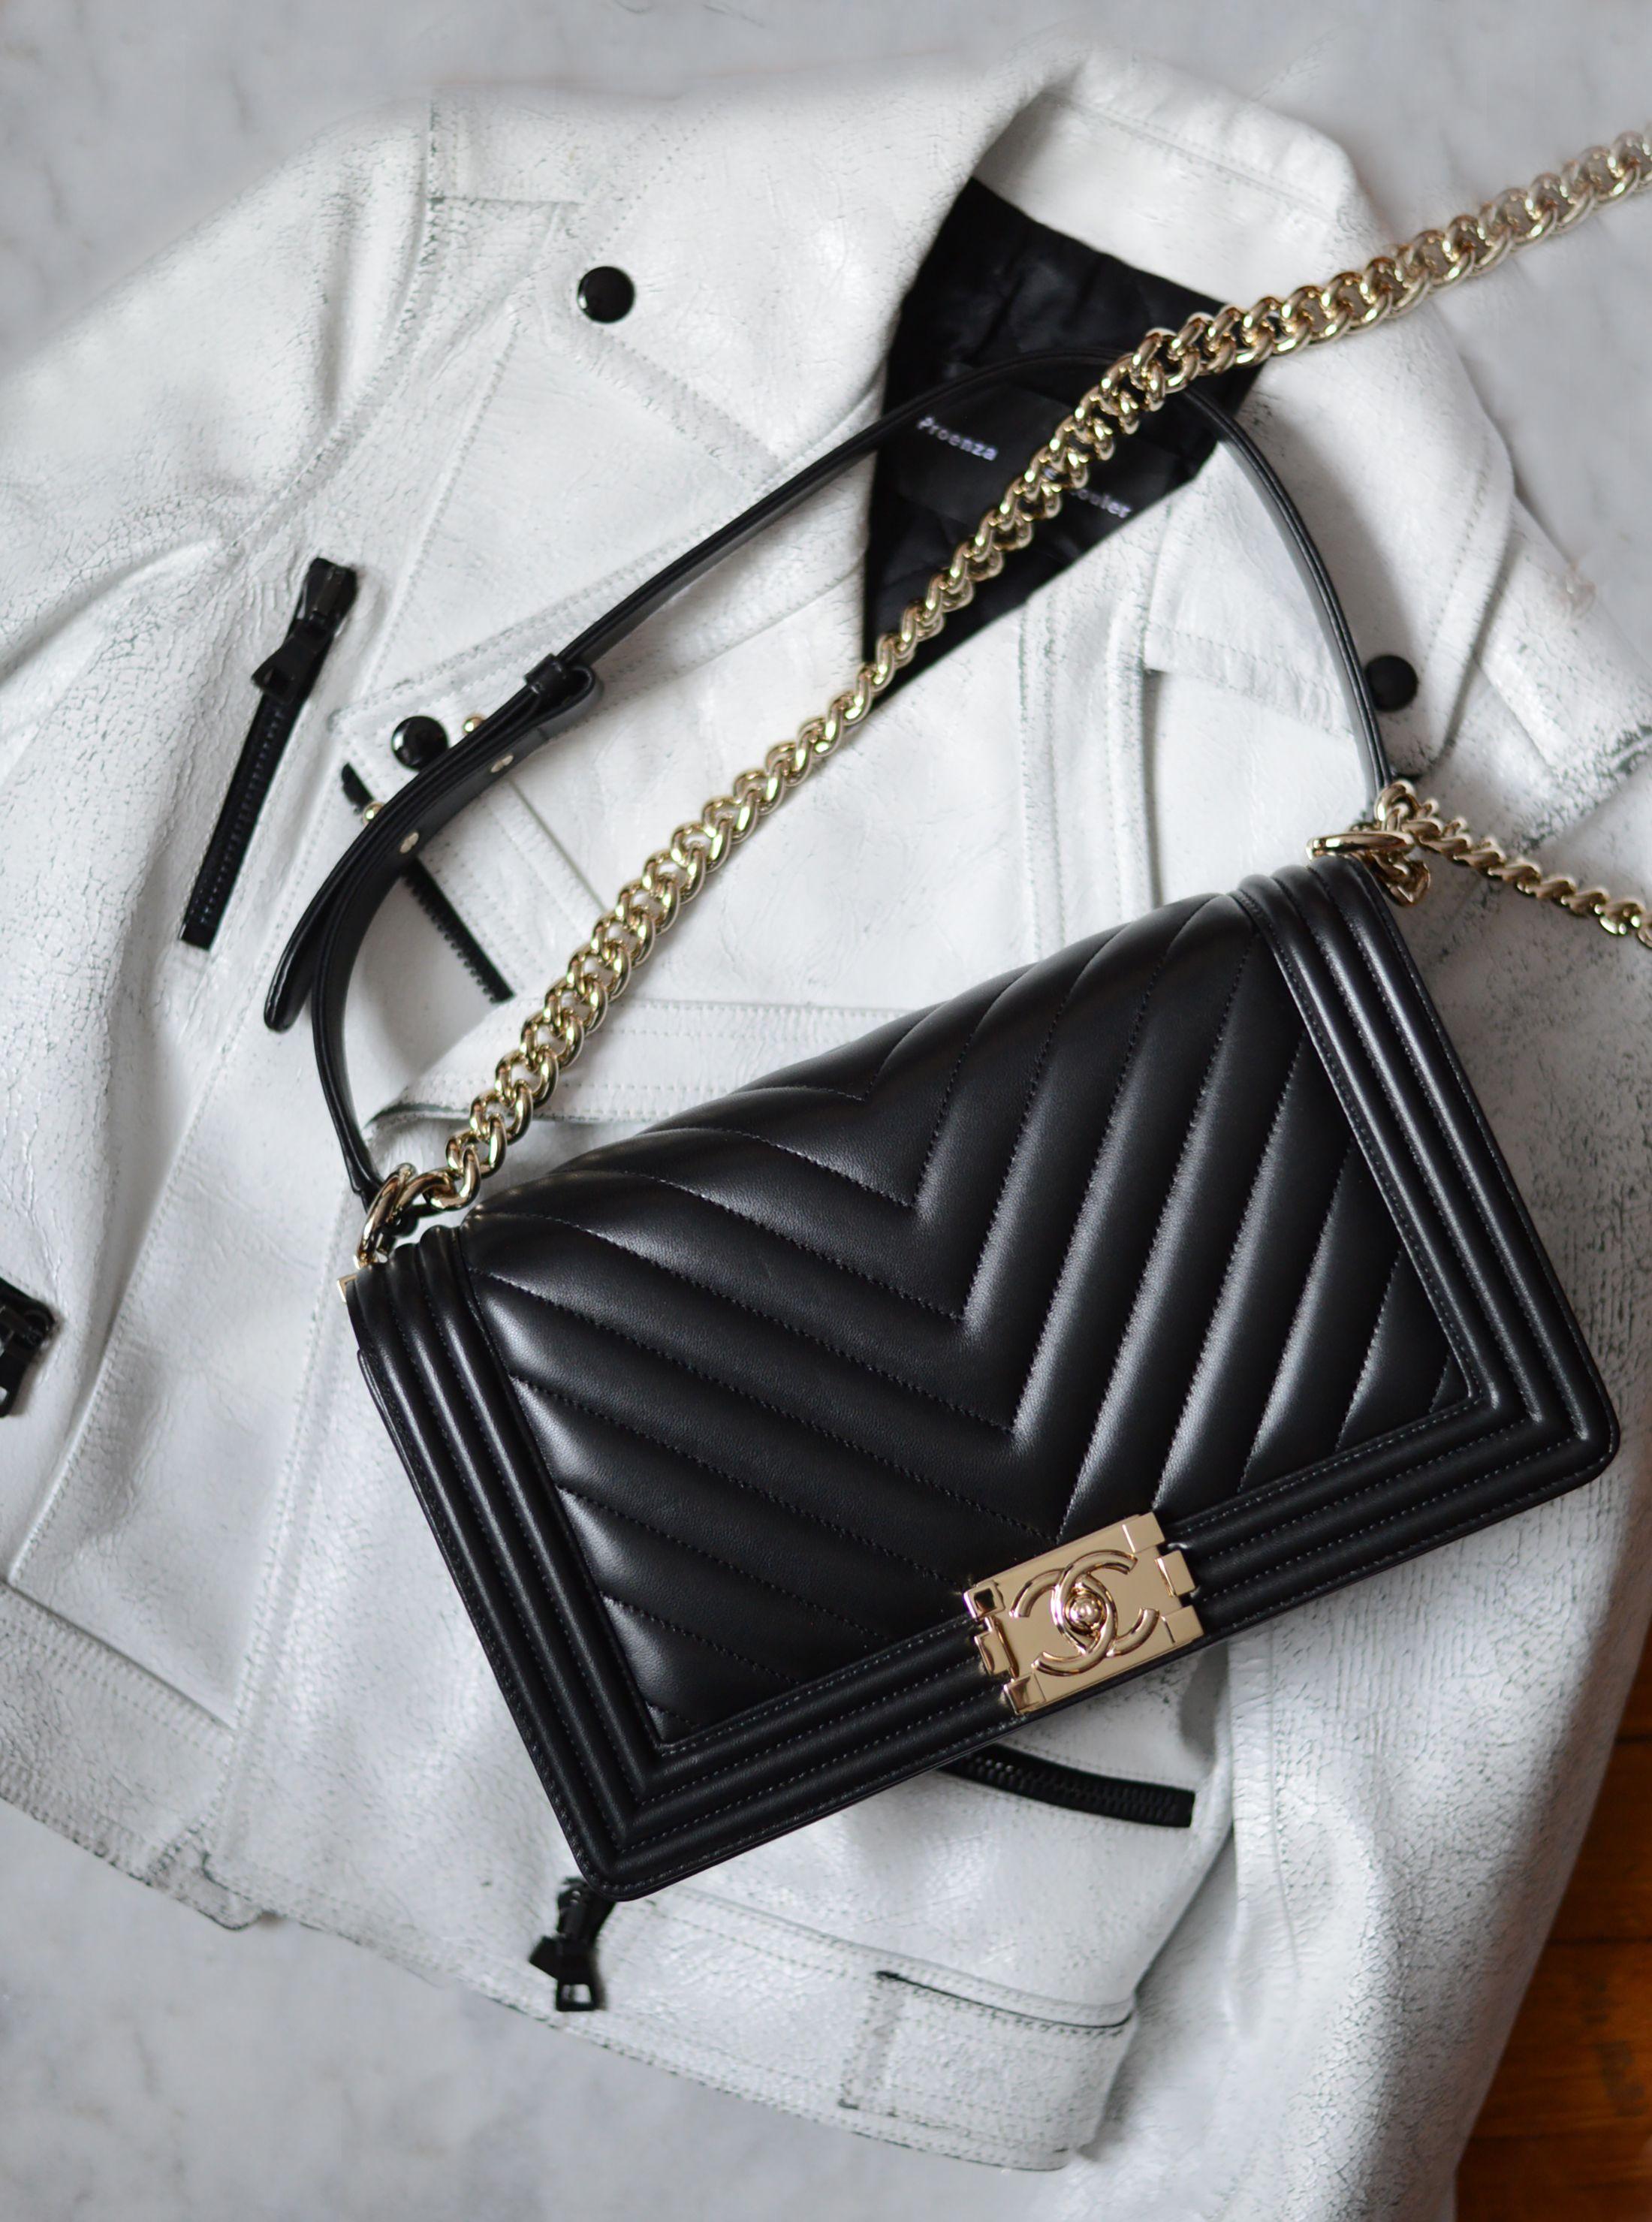 cb8a3c709458 Bag  Chanel Chevron Boy Bag New Medium Champagne Gold hardware Jacket   Proenza Schouler